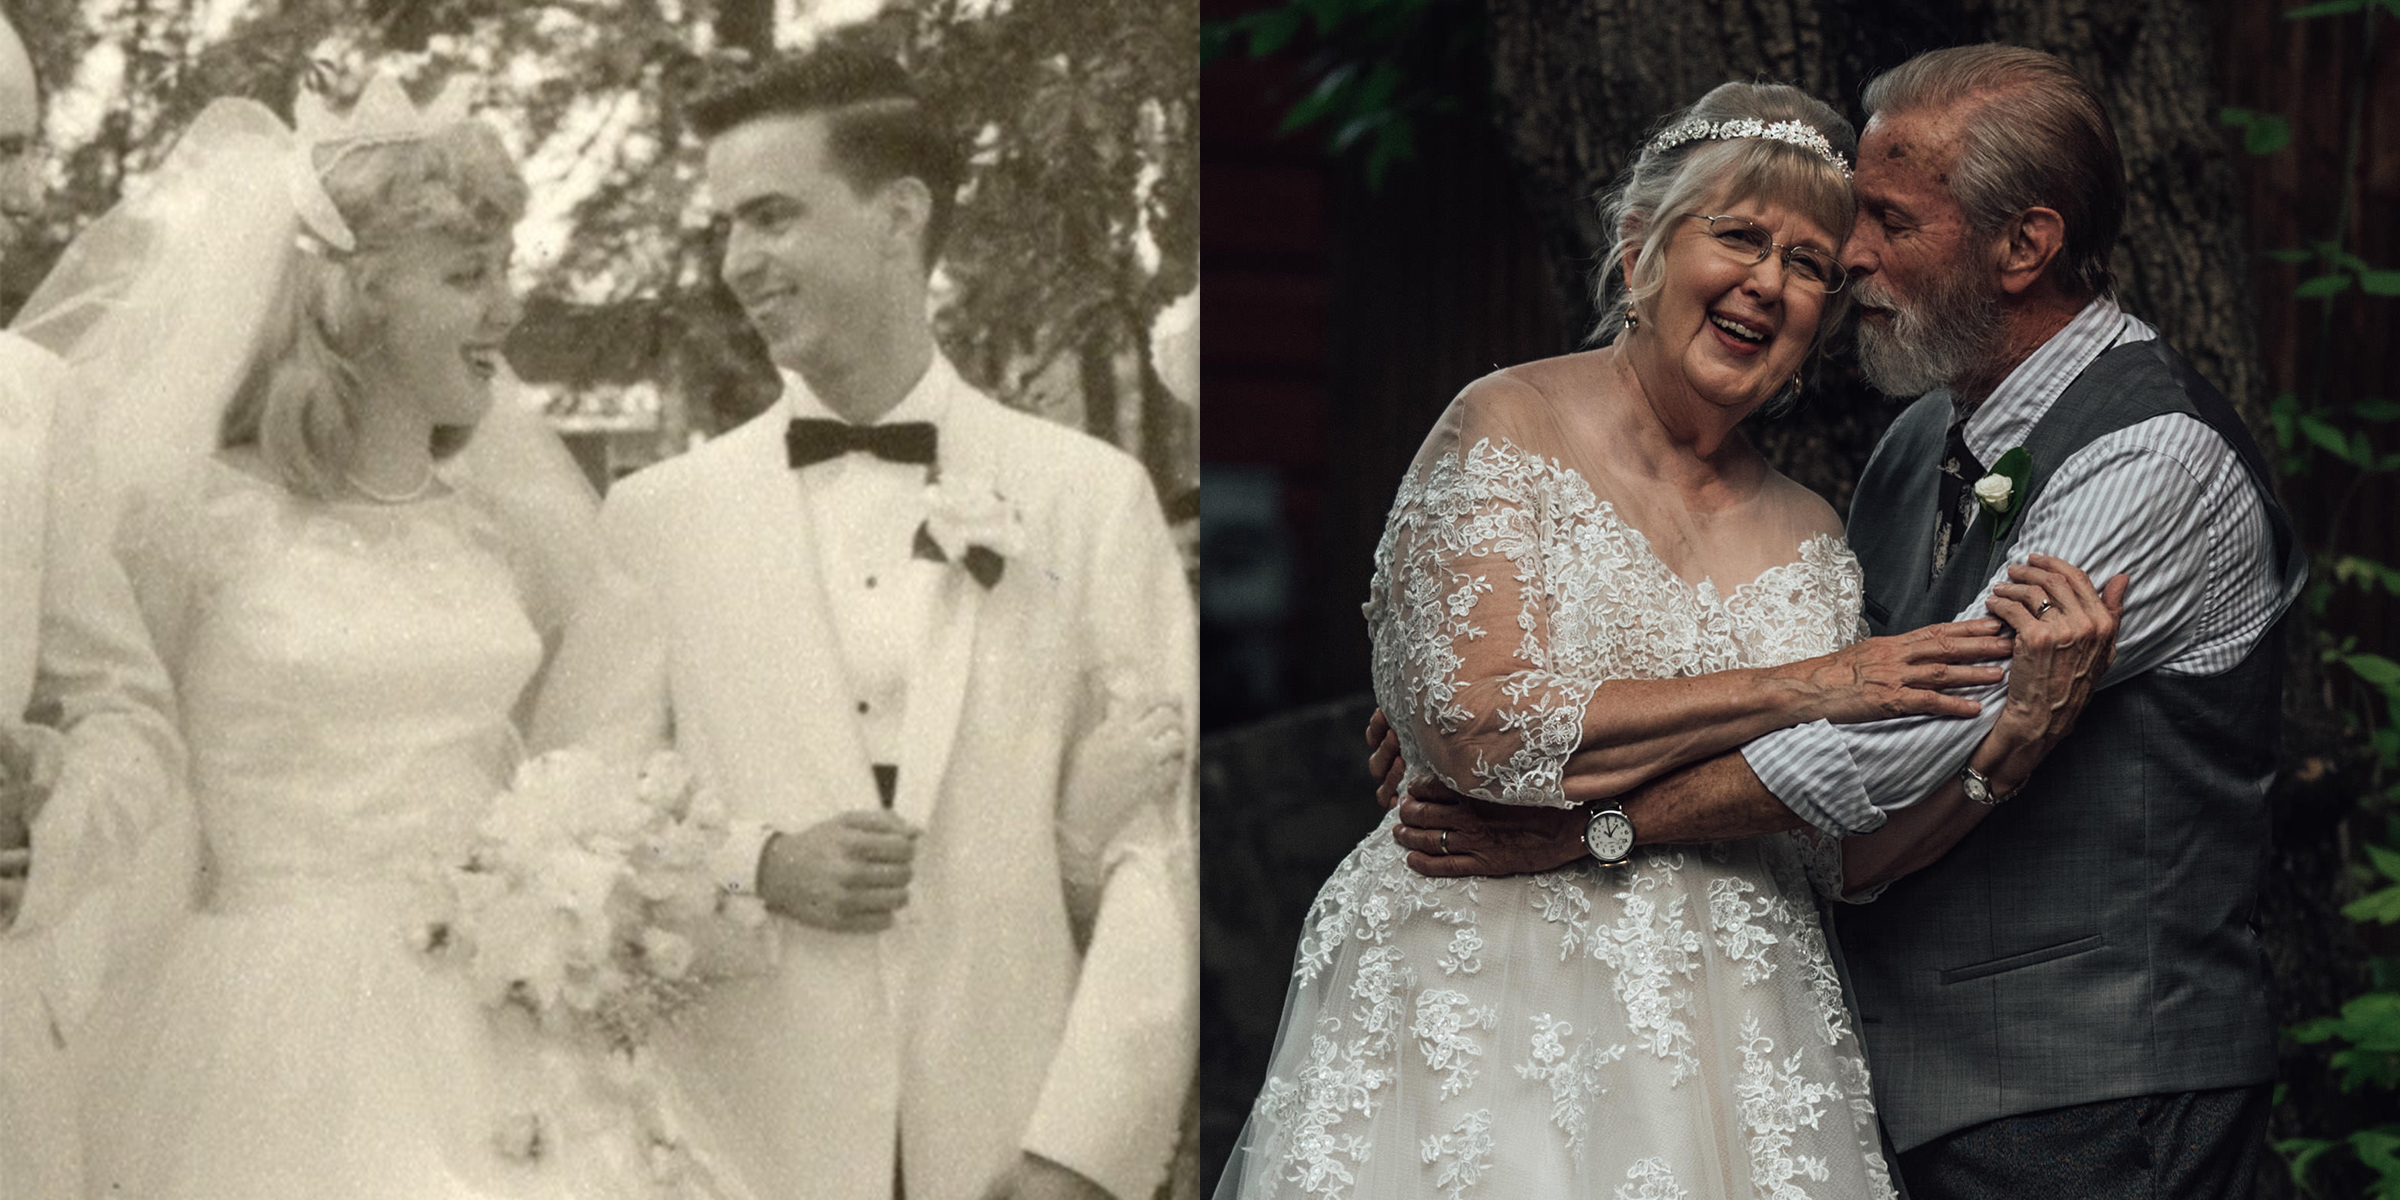 Wedding Photographer Surprises Grandparents With Anniversary Photo